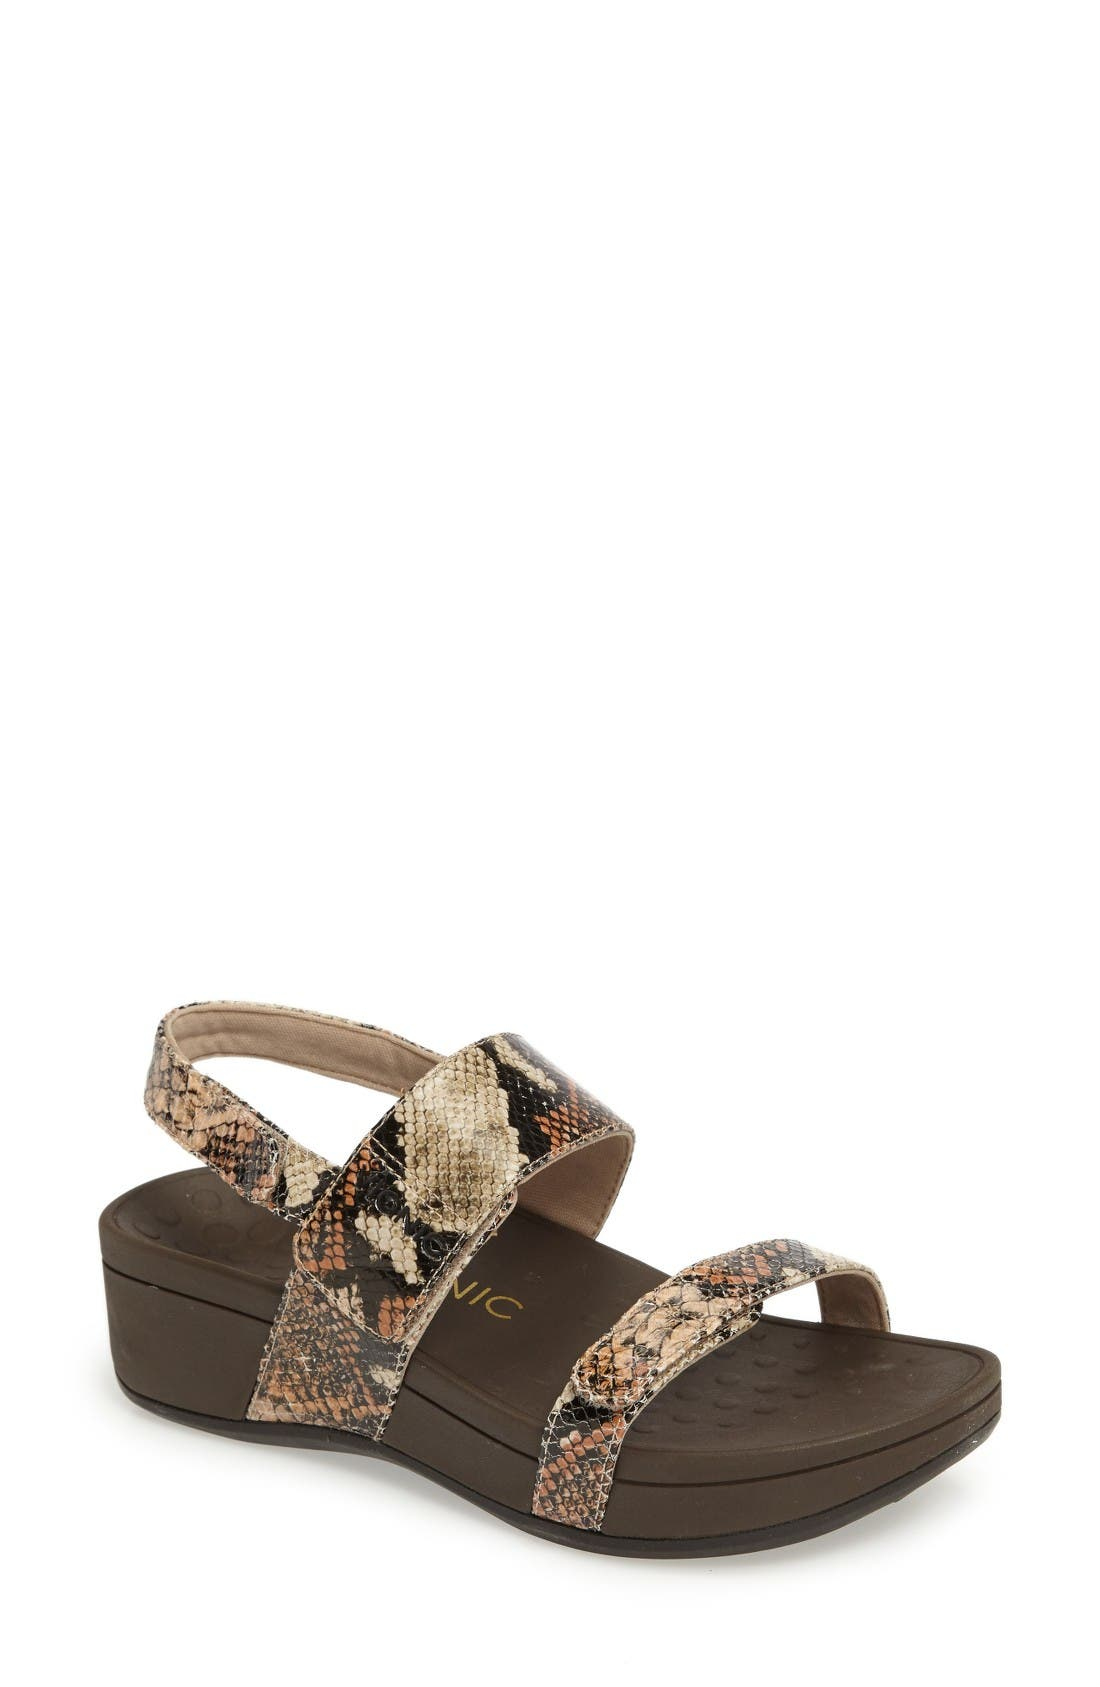 VIONIC Bolinas Platform Sandal